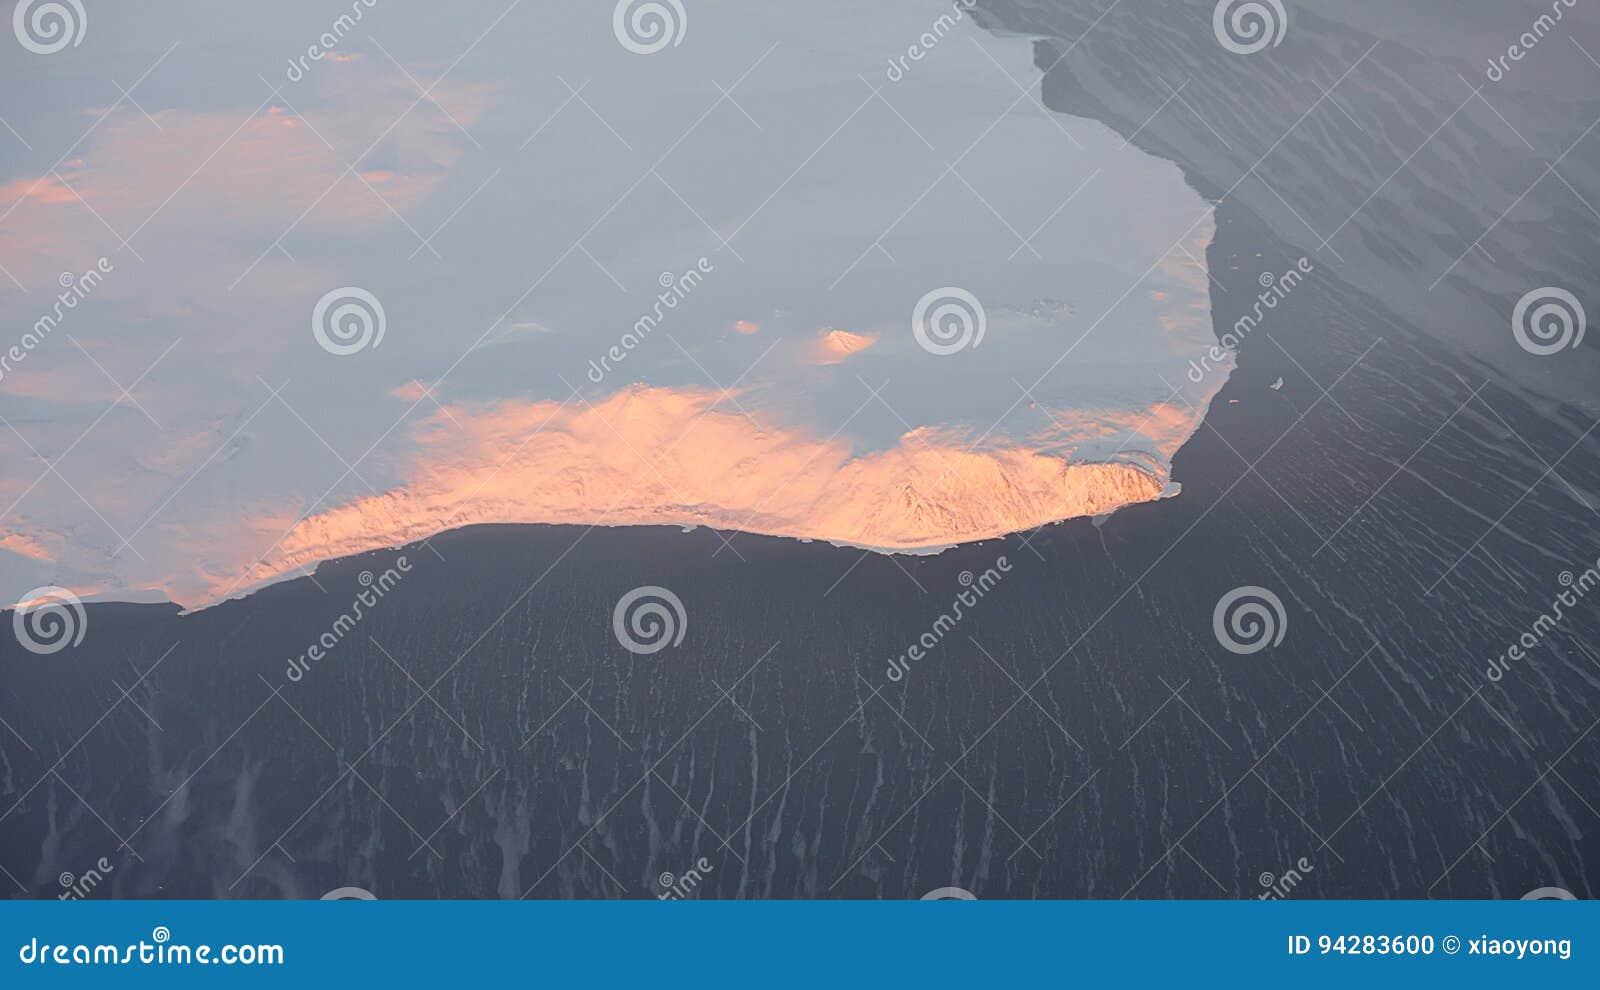 Айсберг плавя, изменение климата Сибиря